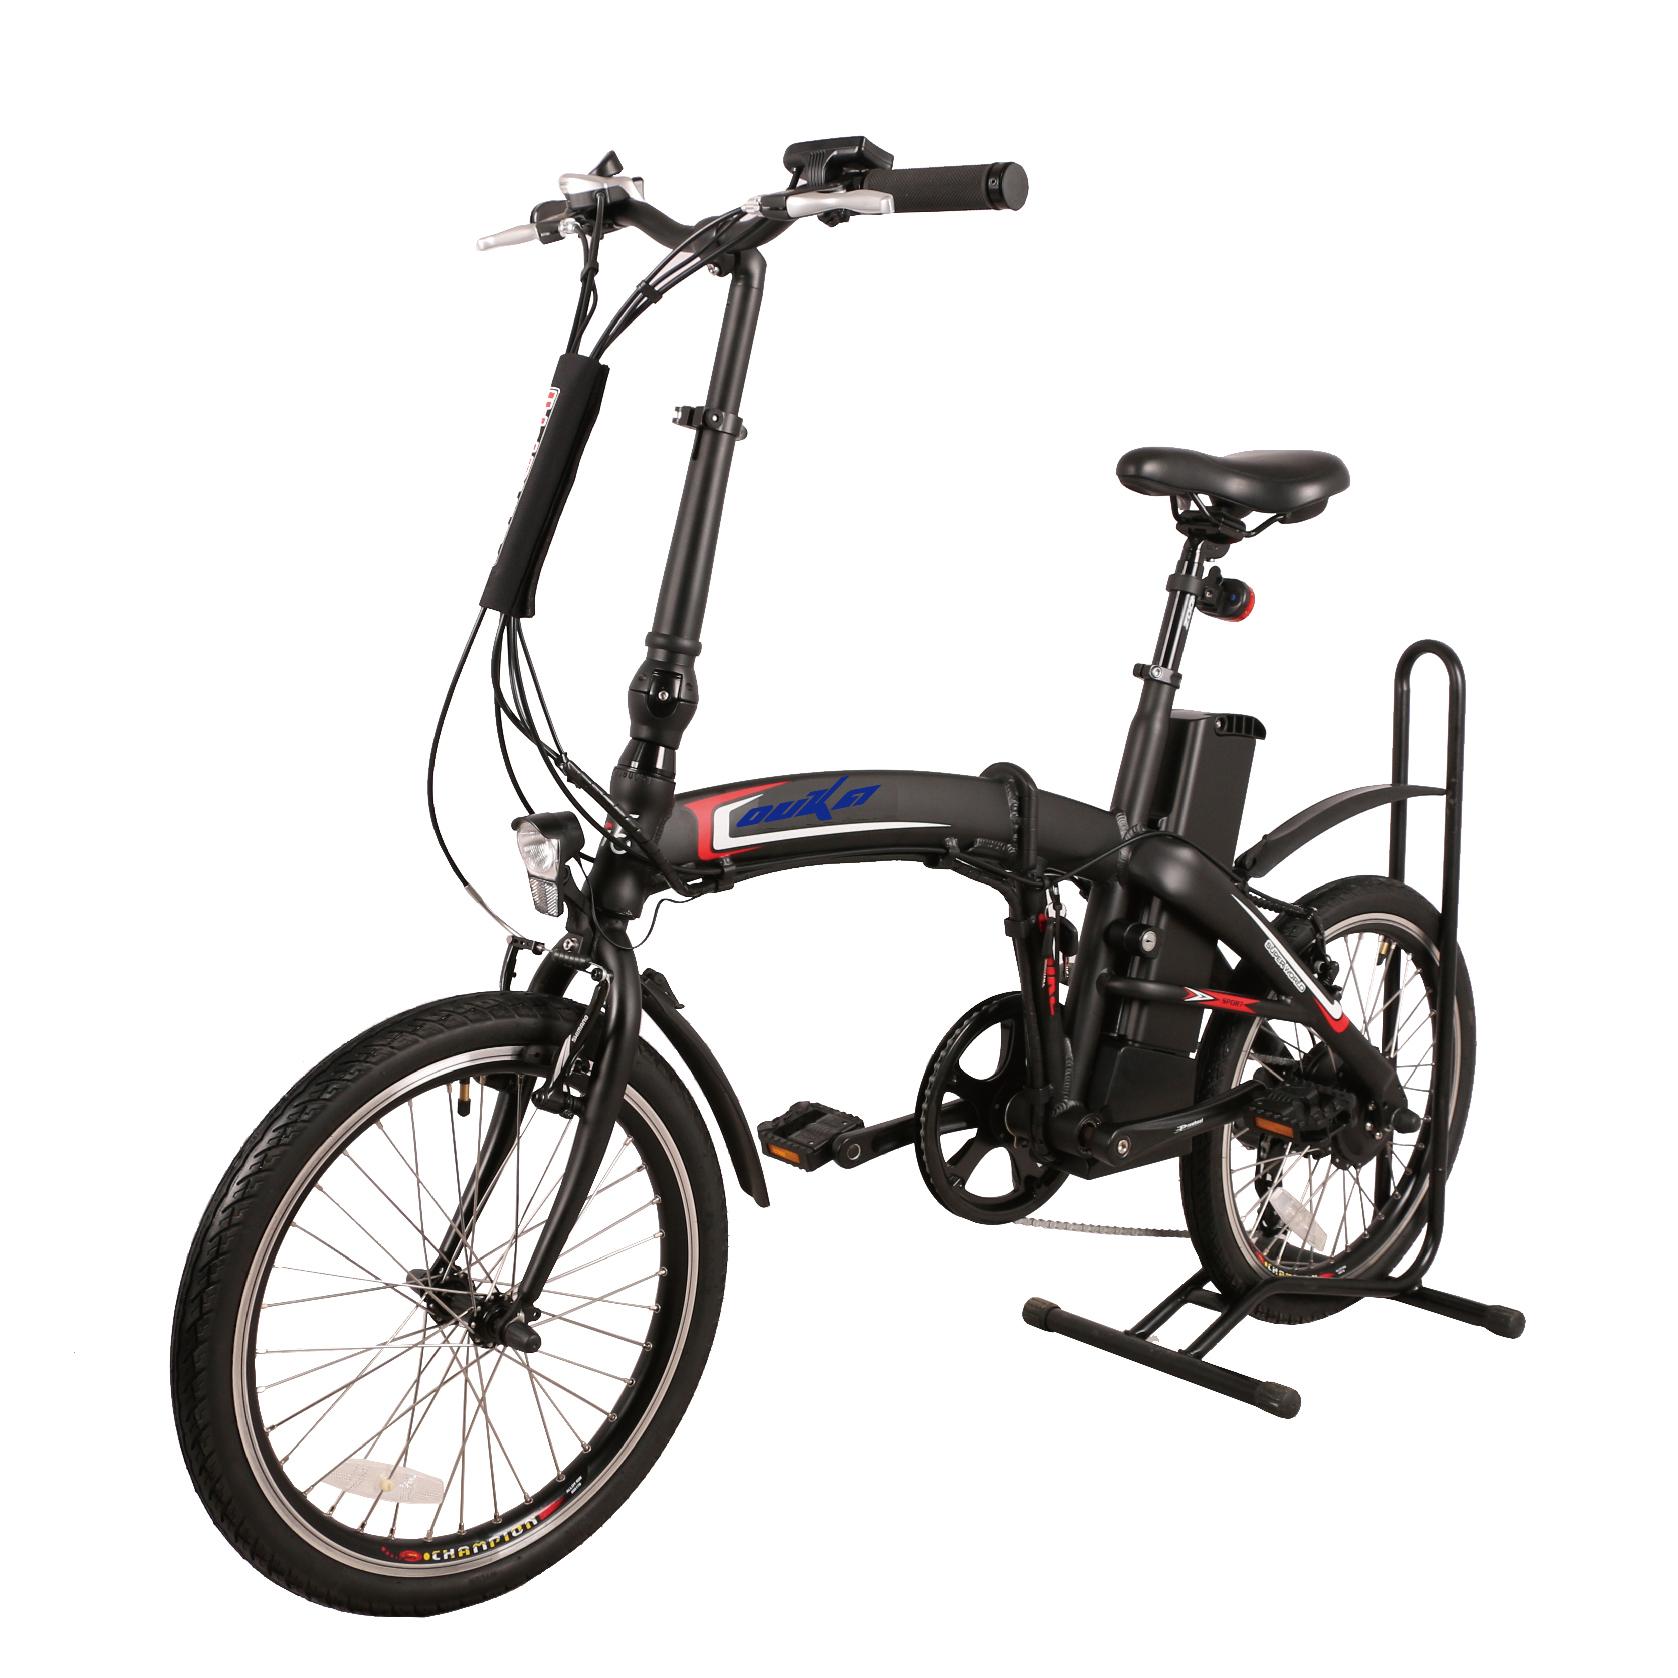 20 Inch Light Weight 36v 250w Eu Standard 25km H Rear Drive Gear Brushless Hub Motor Folding Electric Bicycle